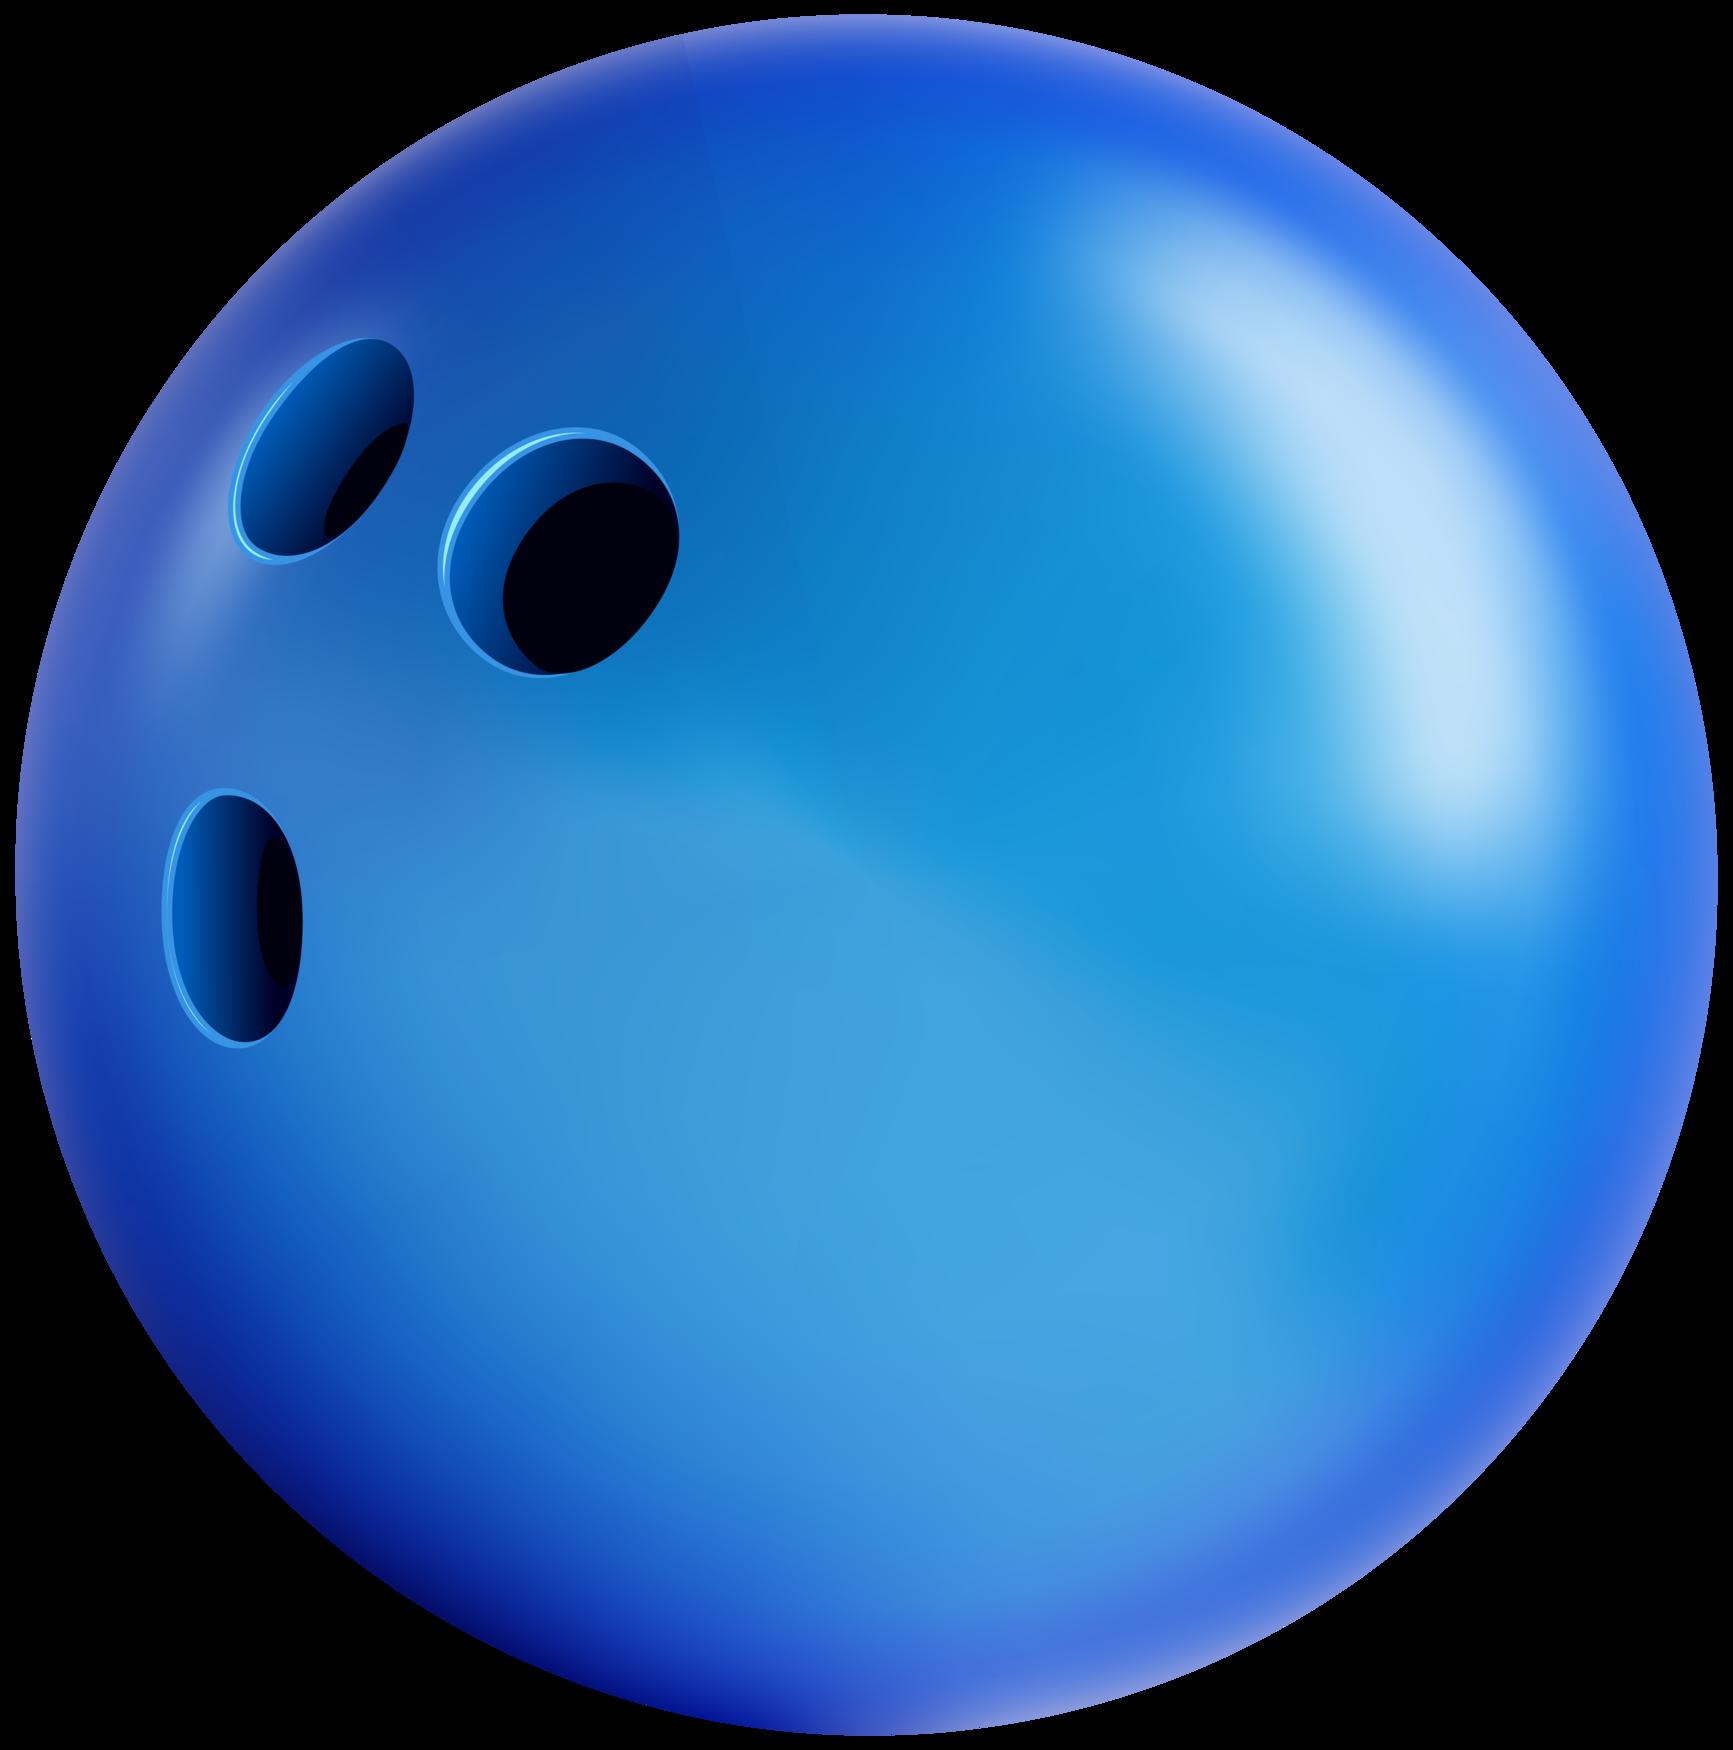 Clipart man bowling. Ball png clip art